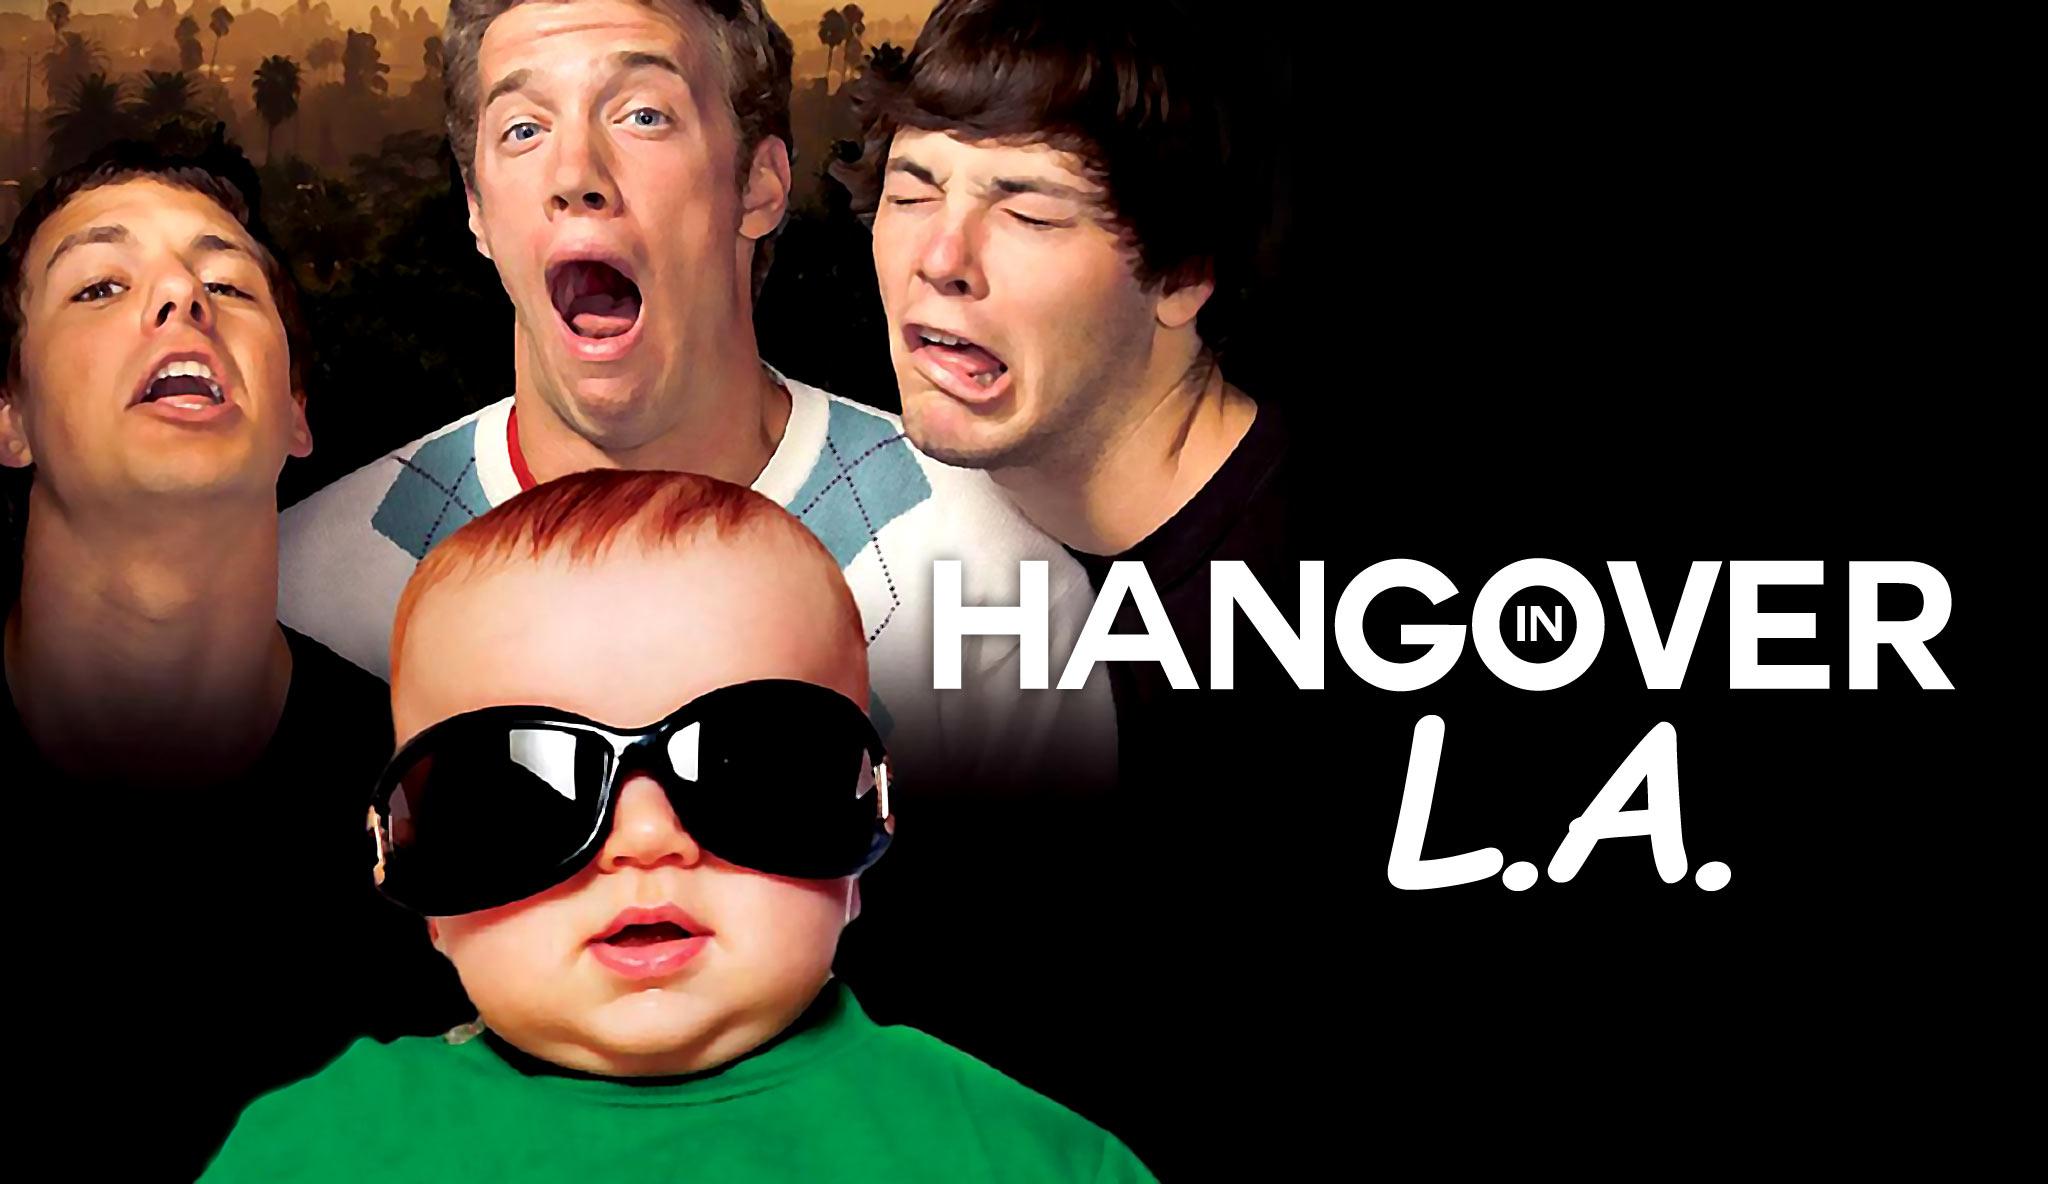 hangover-in-l-a\header.jpg